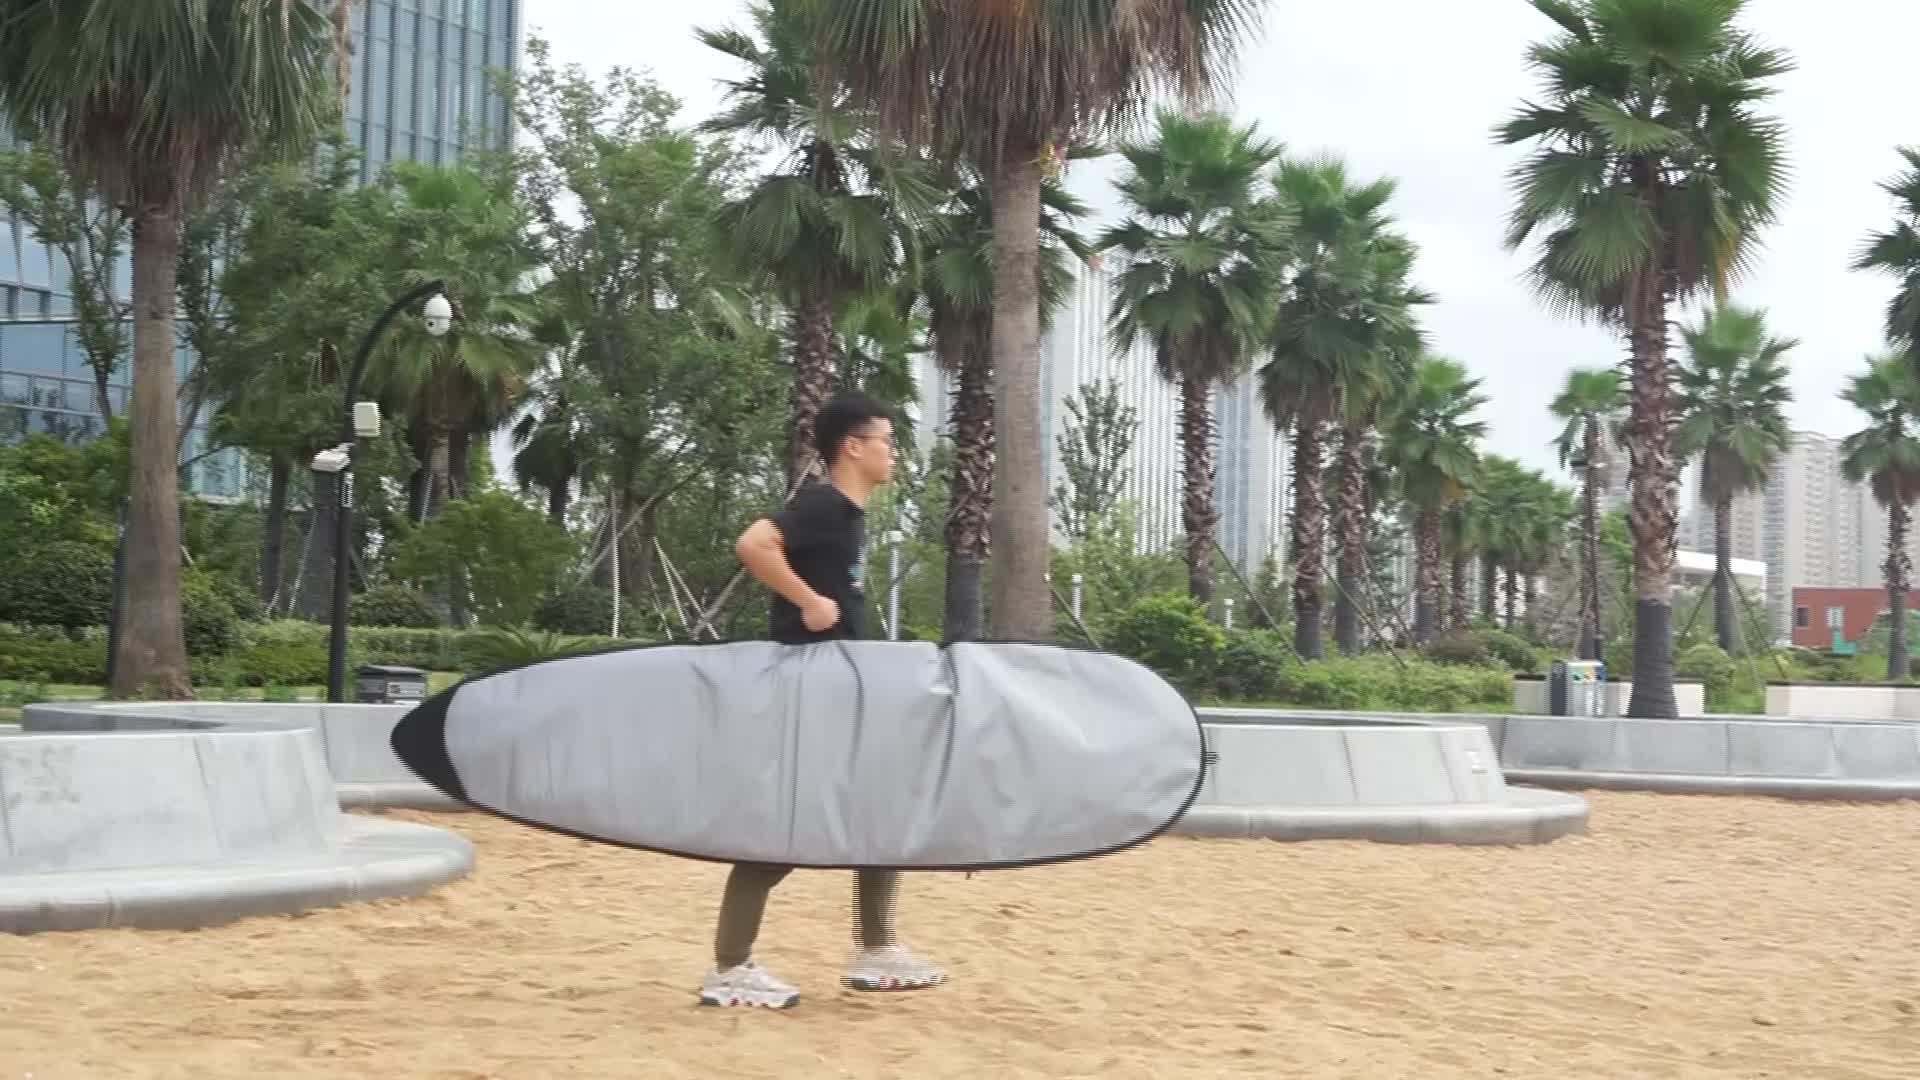 Silber farbe surfbrett typ sup bord tasche für stand up paddle board